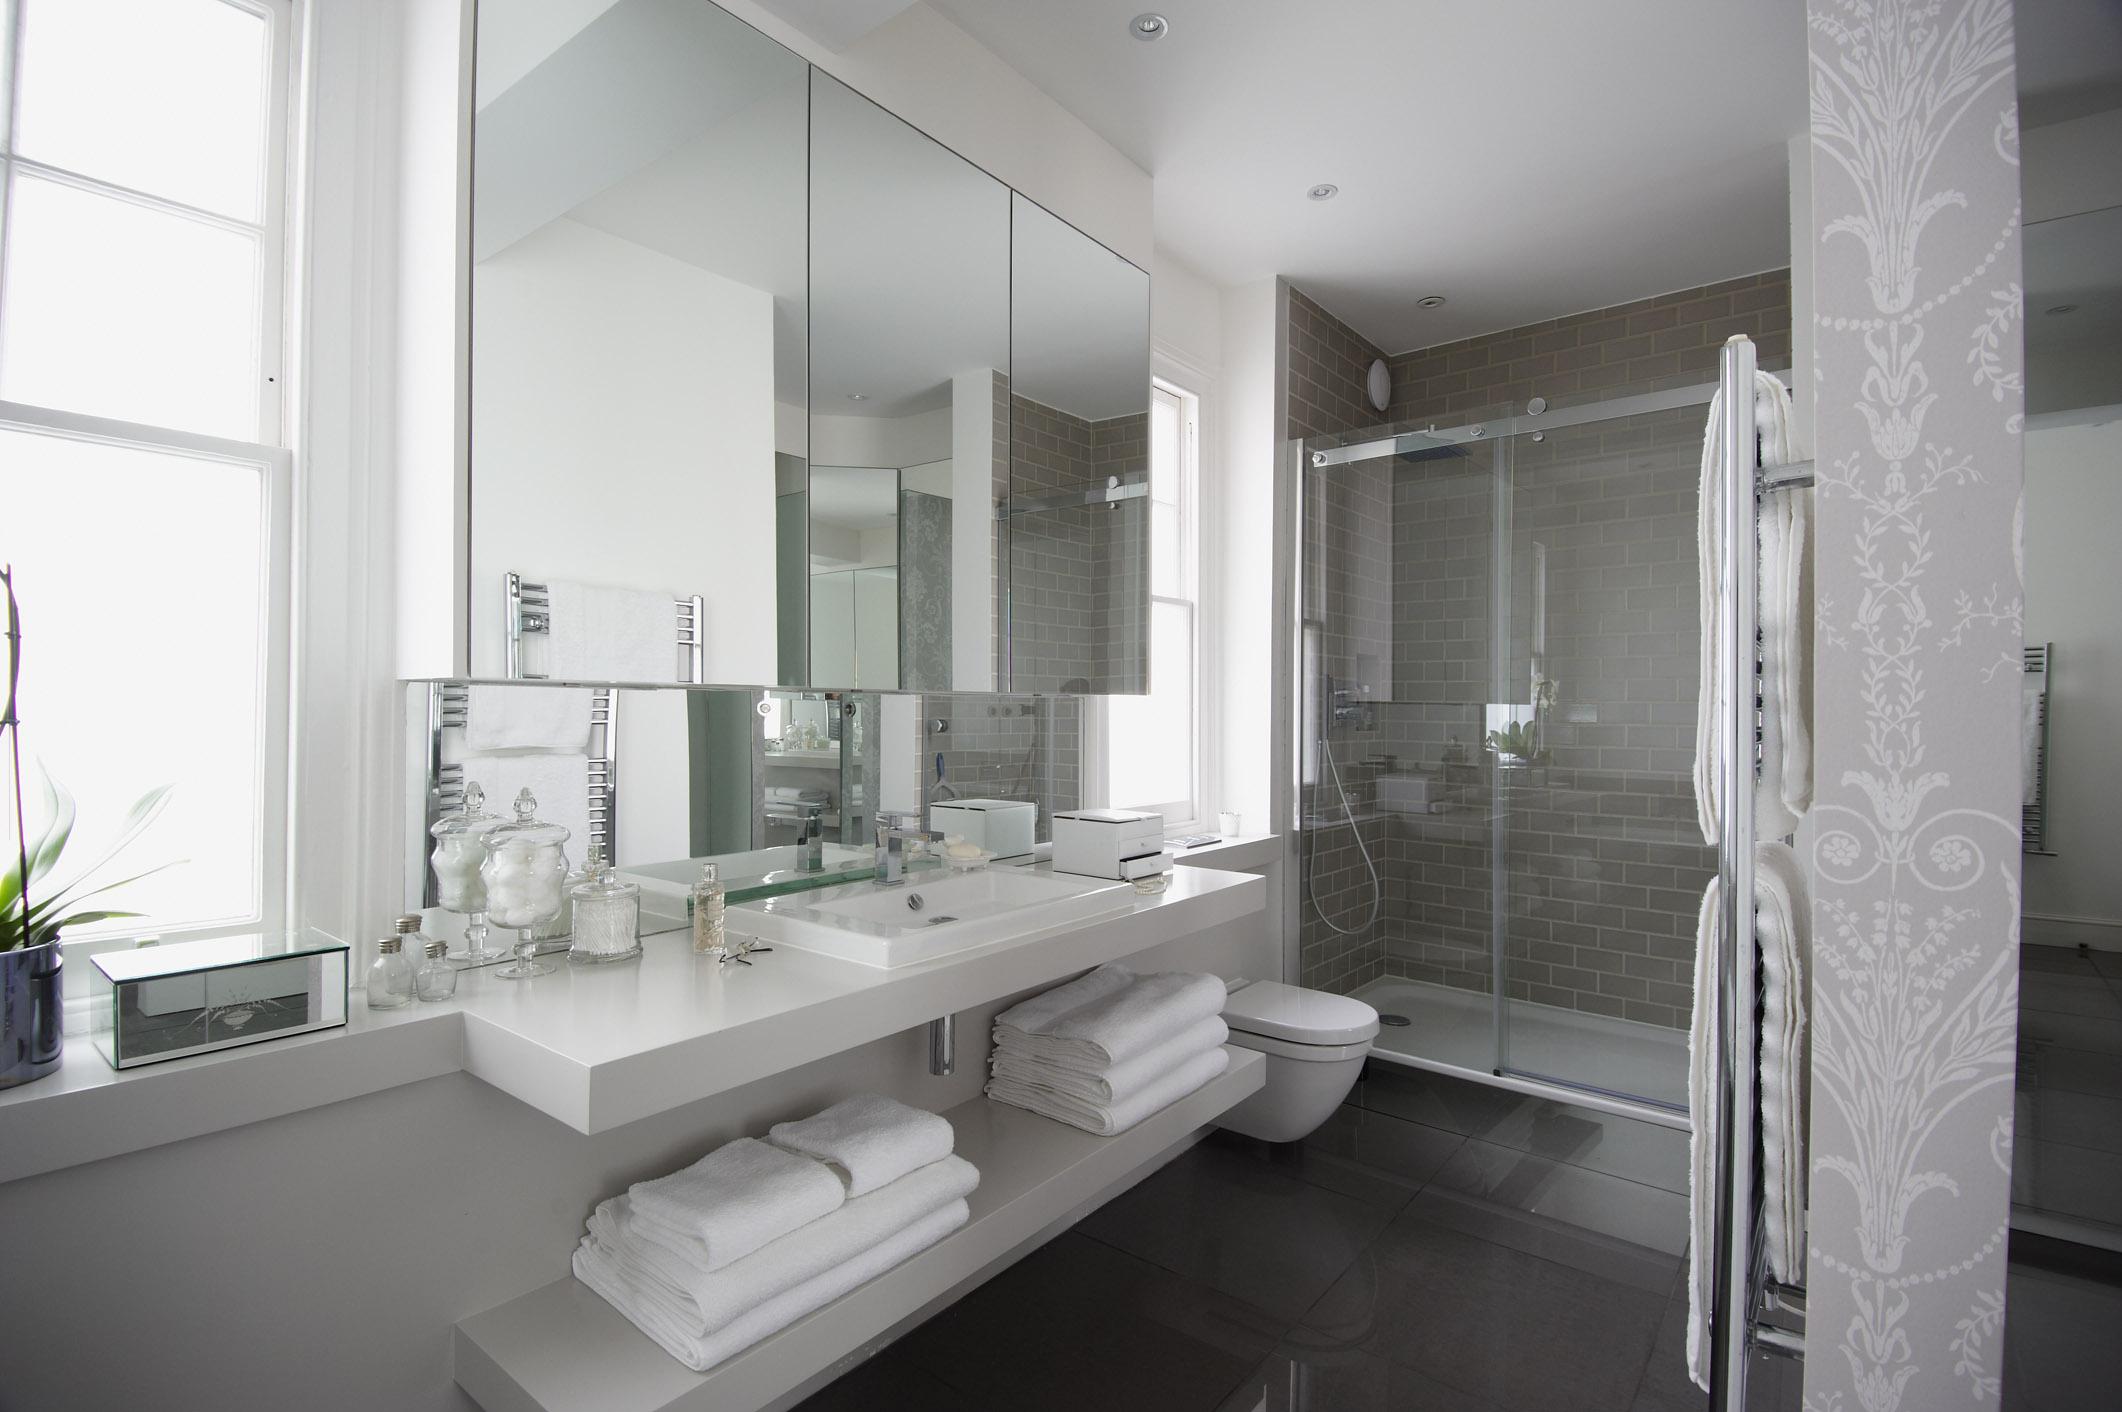 Edwardian House Interior Design London Gabi Da Rocha Interiors - Edwardian house interiors